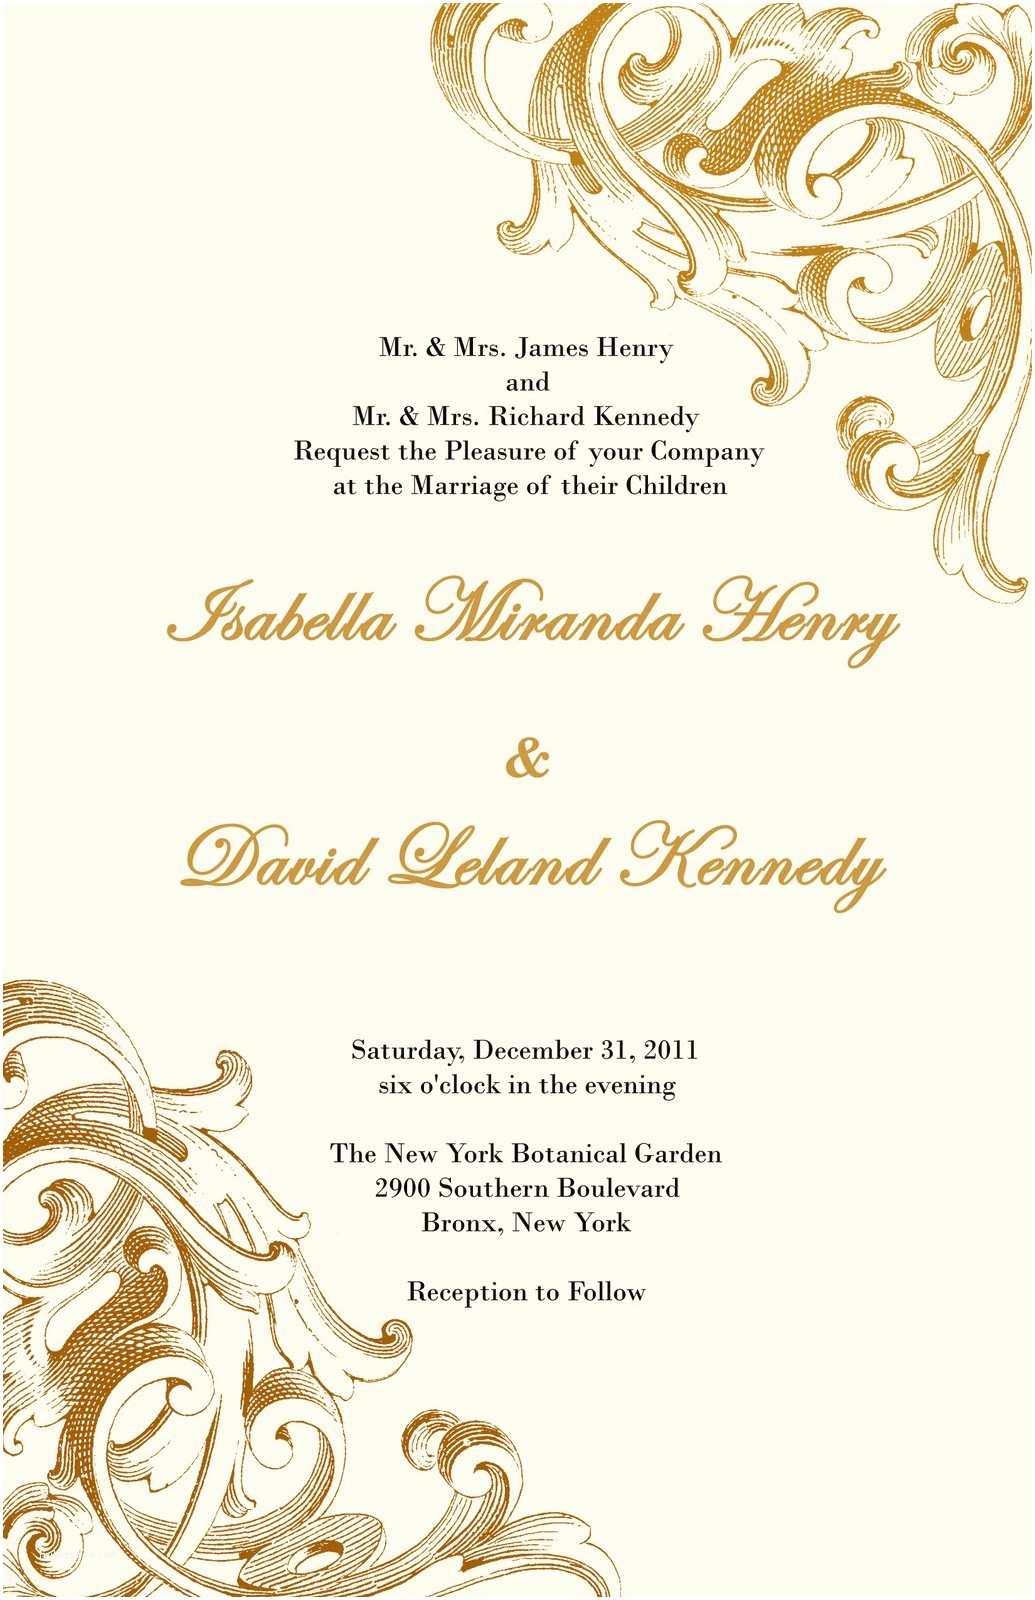 Wedding Invitation Designs Beautiful Wedding Invitation Background Designs – Weneedfun